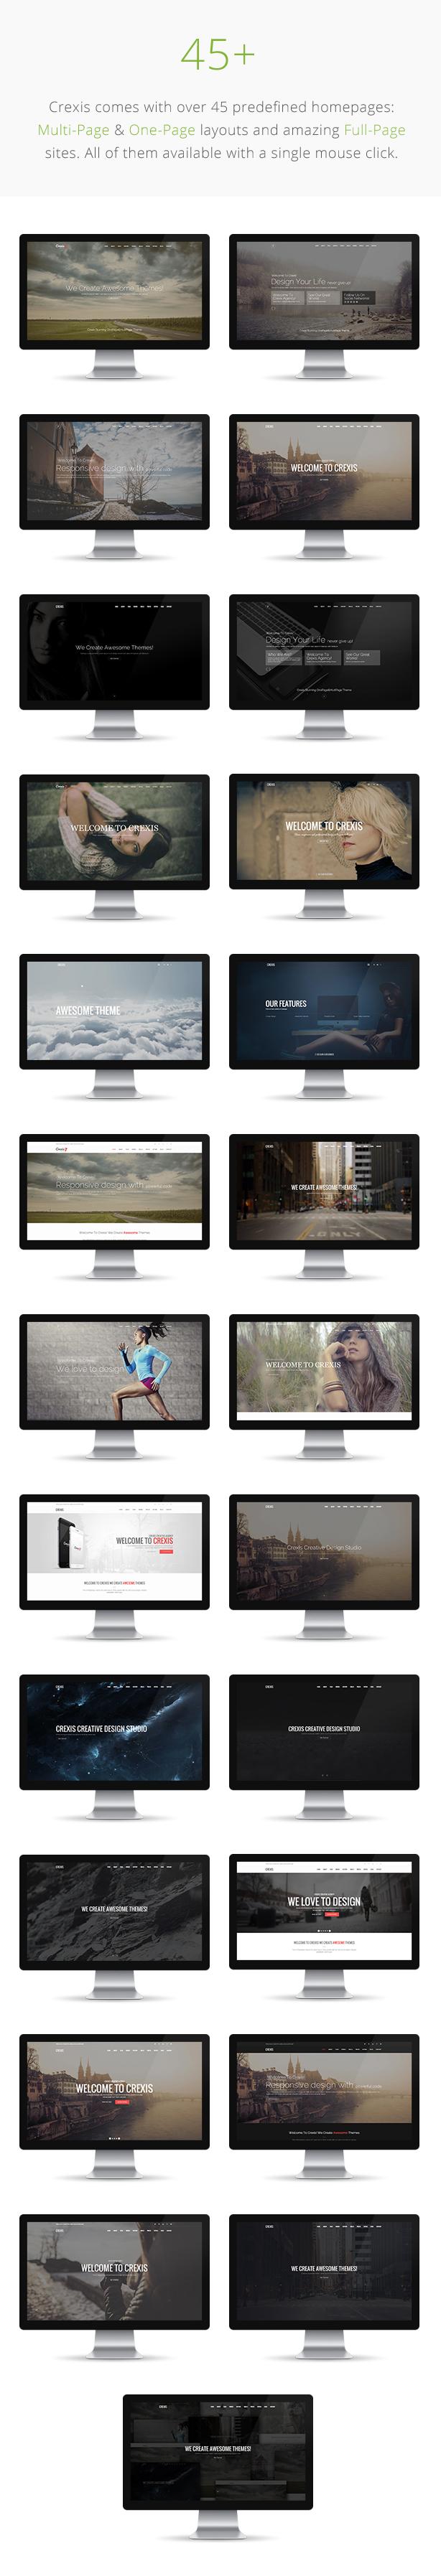 Crexis - Responsive Multi-Purpose WordPress Theme - 5